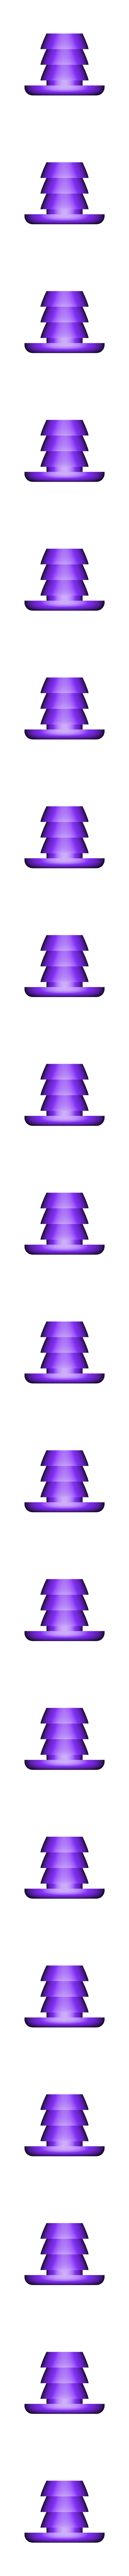 silicone_foot.STL Download free STL file Vibratory Washing Machine • 3D print model, perinski